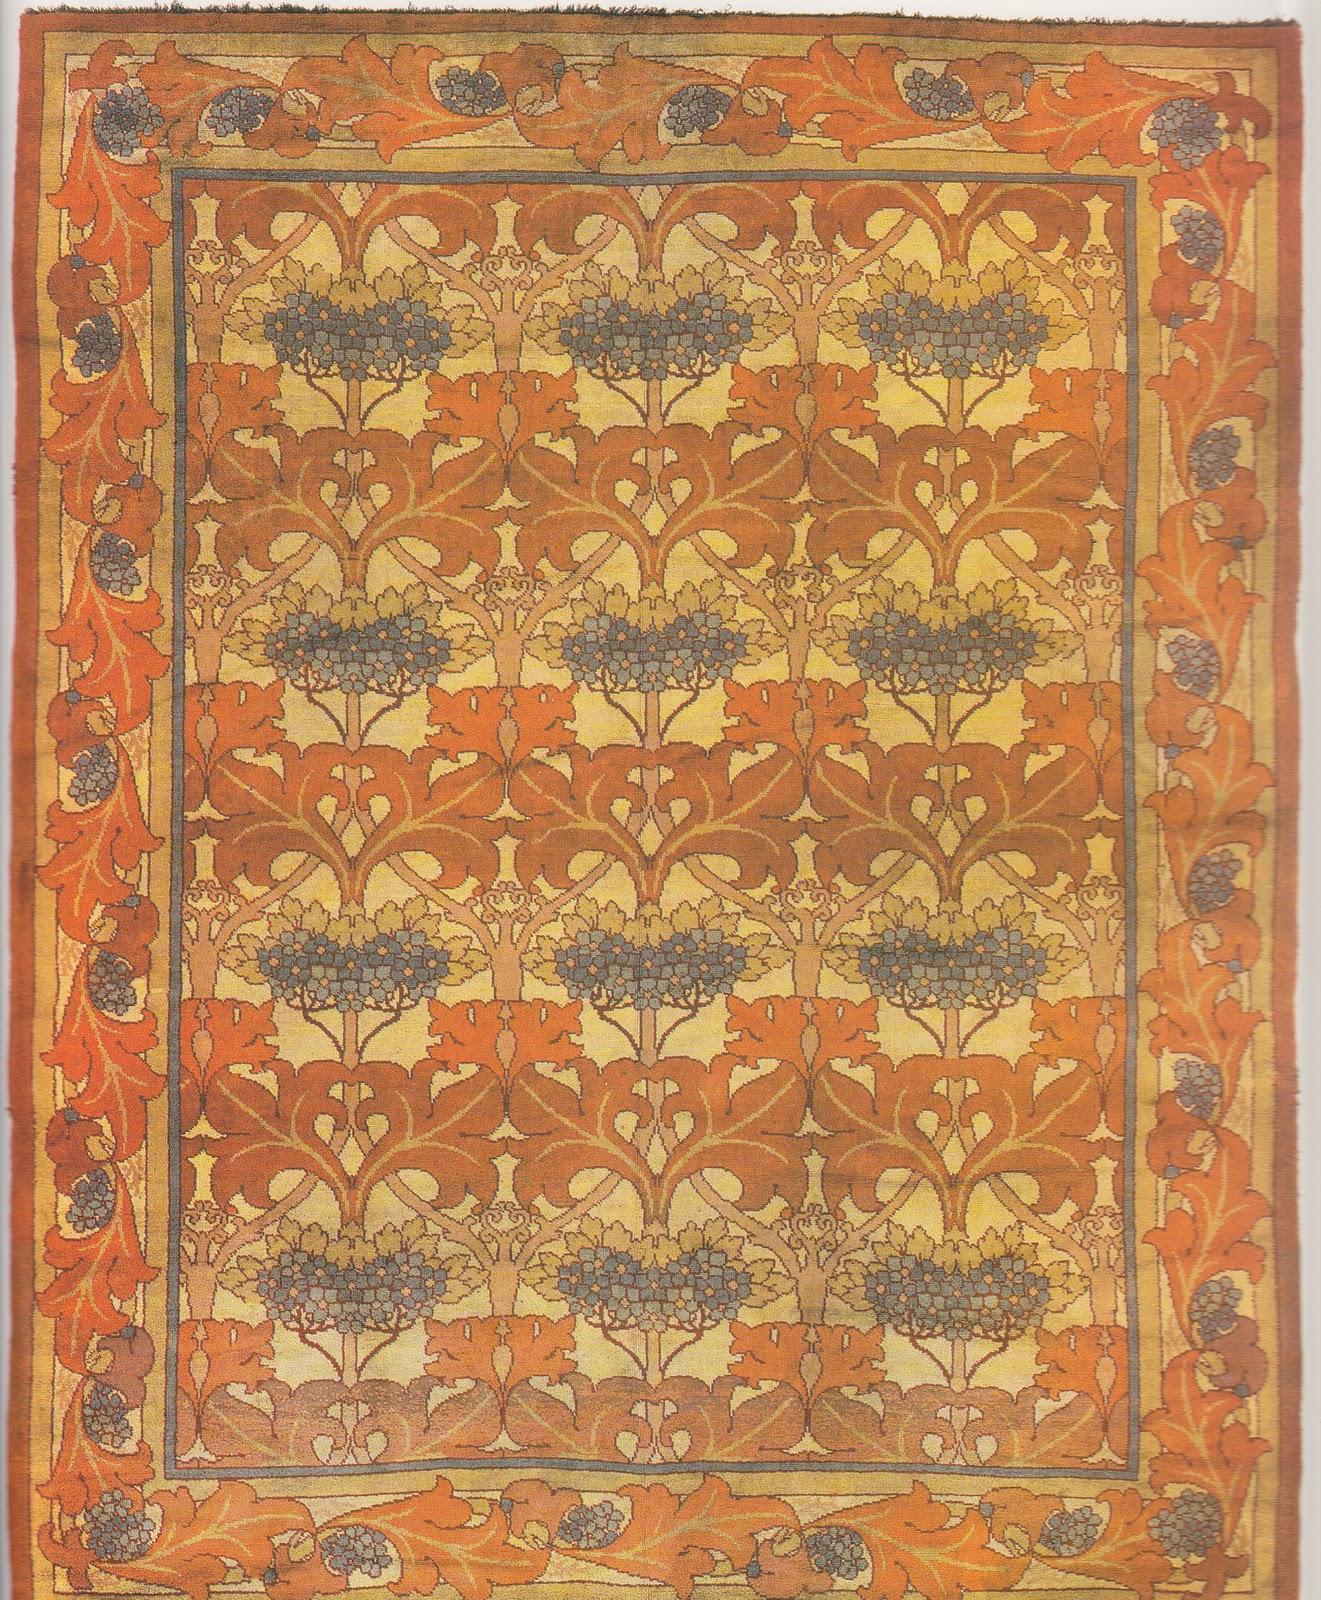 Laurelhurst craftsman bungalow craftsman rug research for Arts and crafts carpet